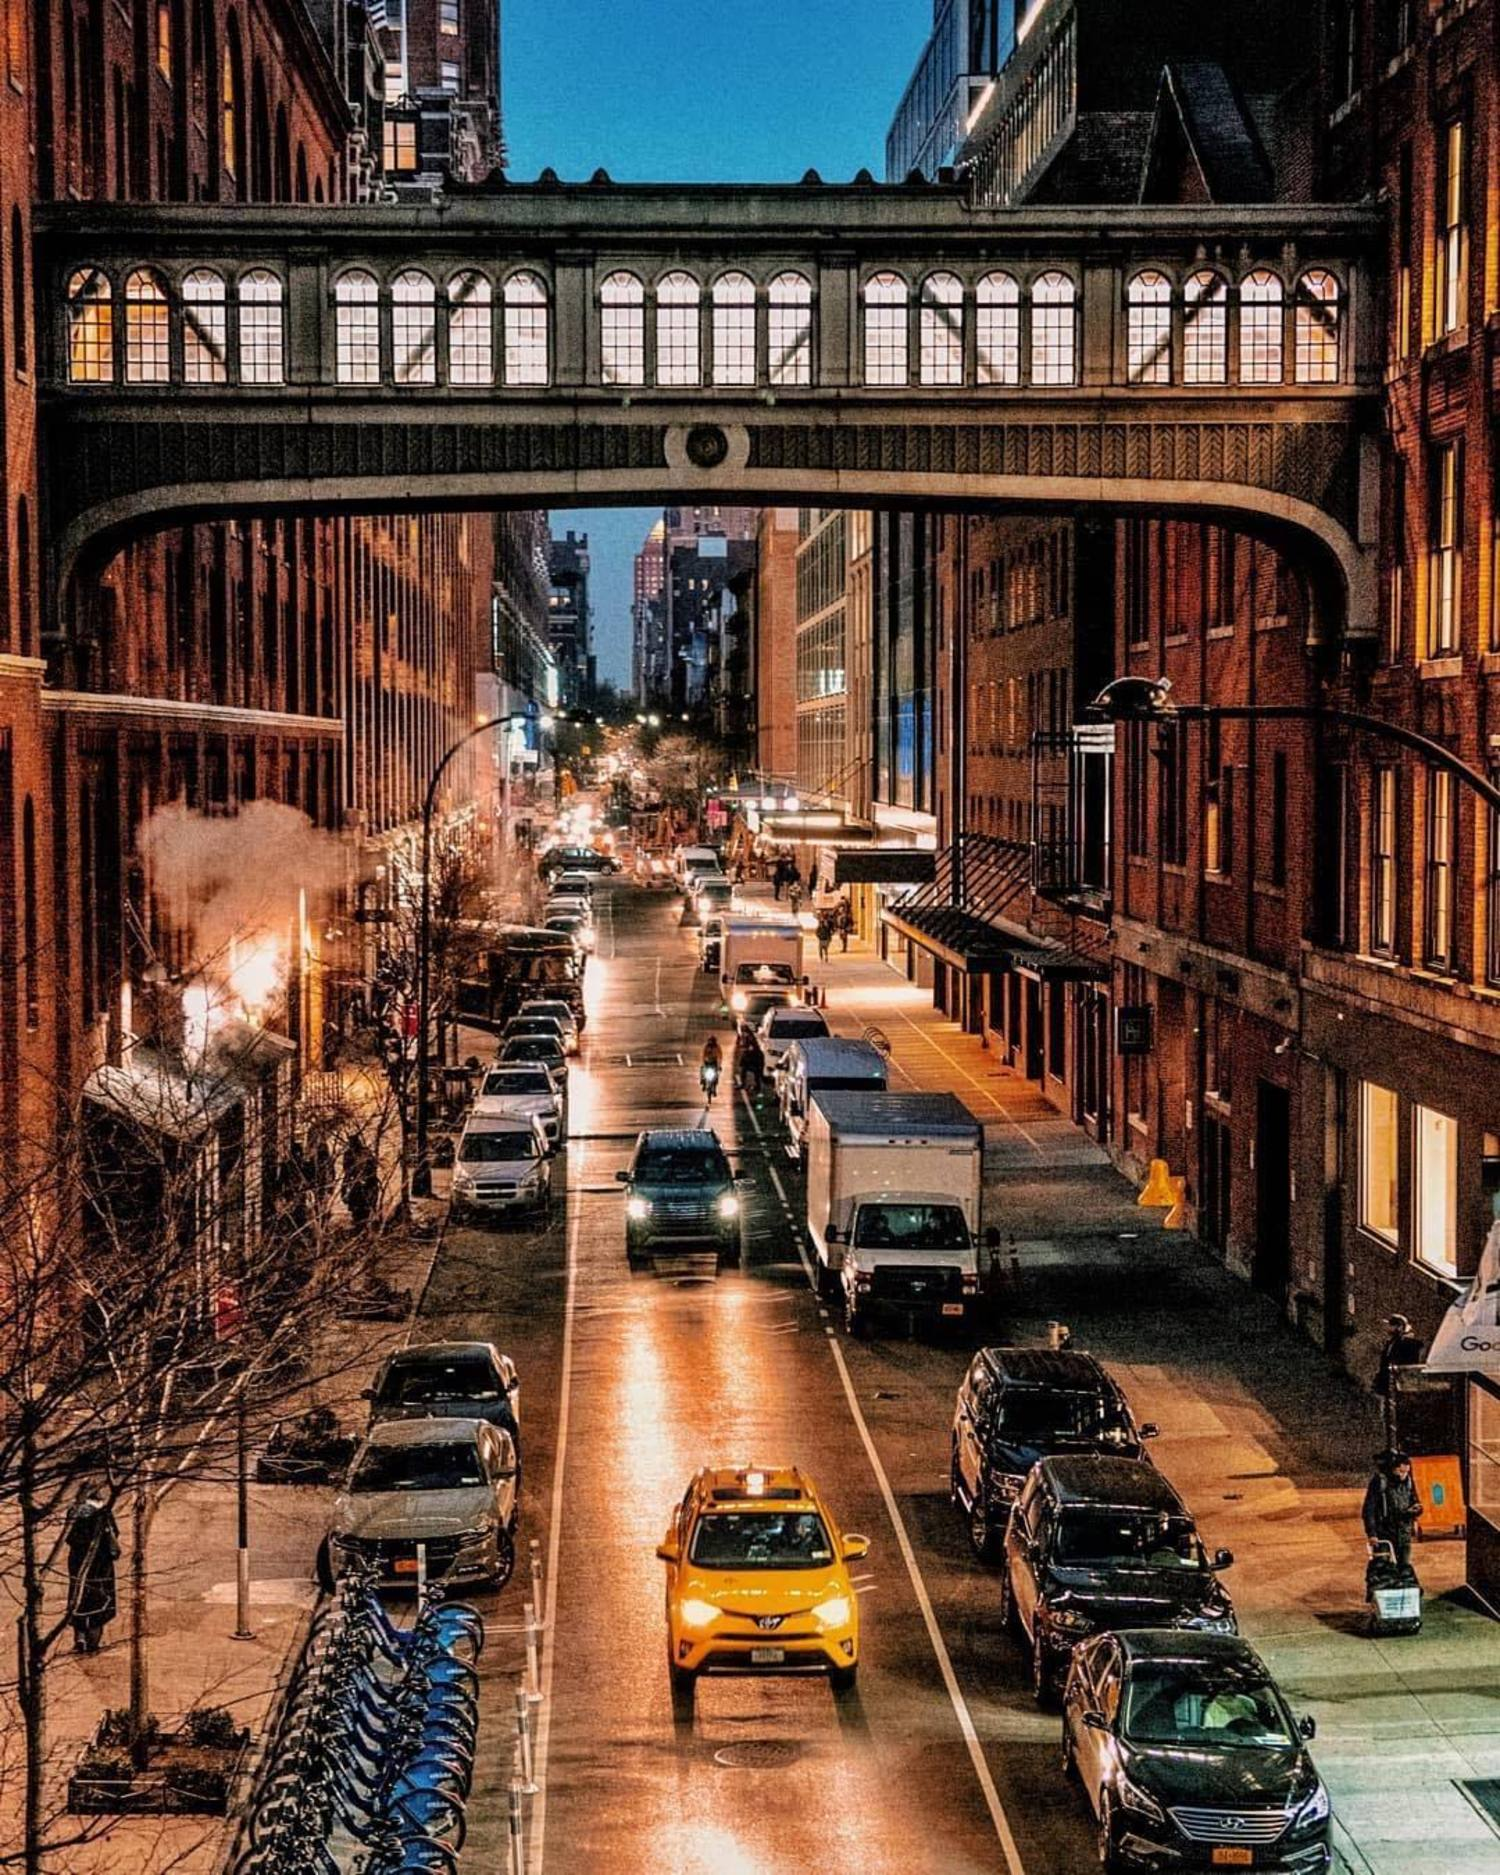 New York, New York. Photo via @ericknyc_ #viewingnyc #nyc #newyork #newyorkcity